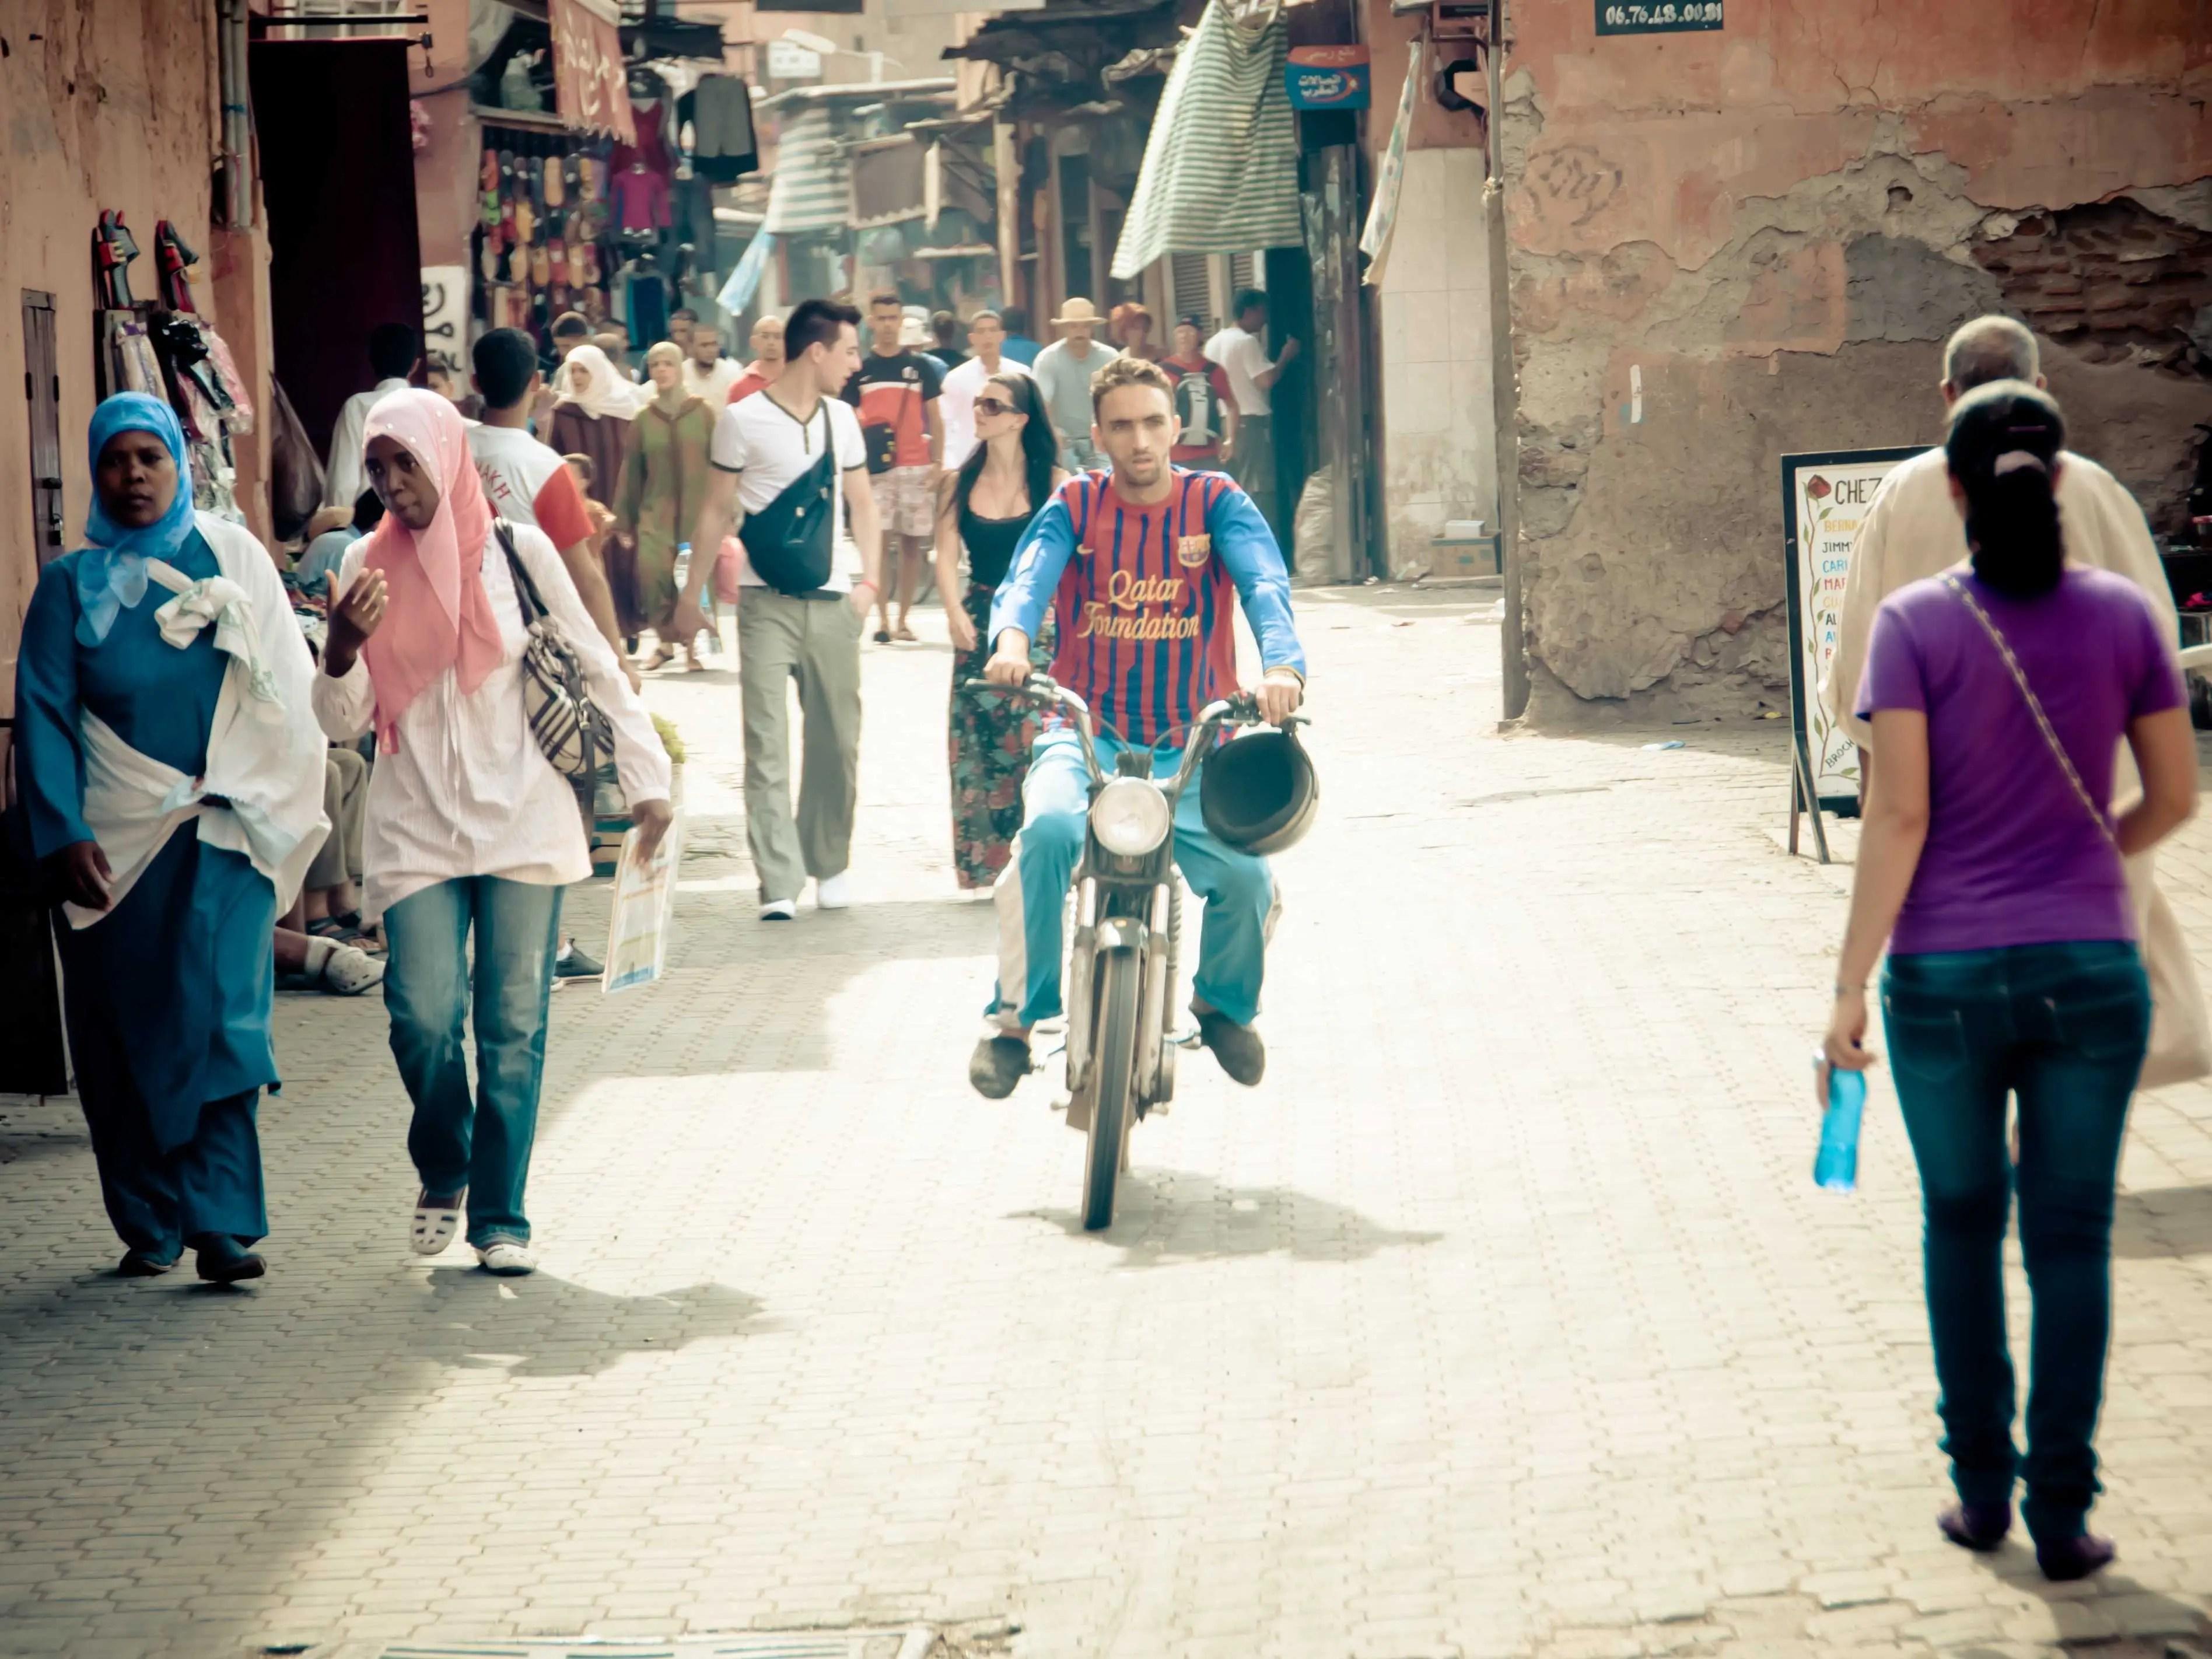 Marrakech morroco woman women travel